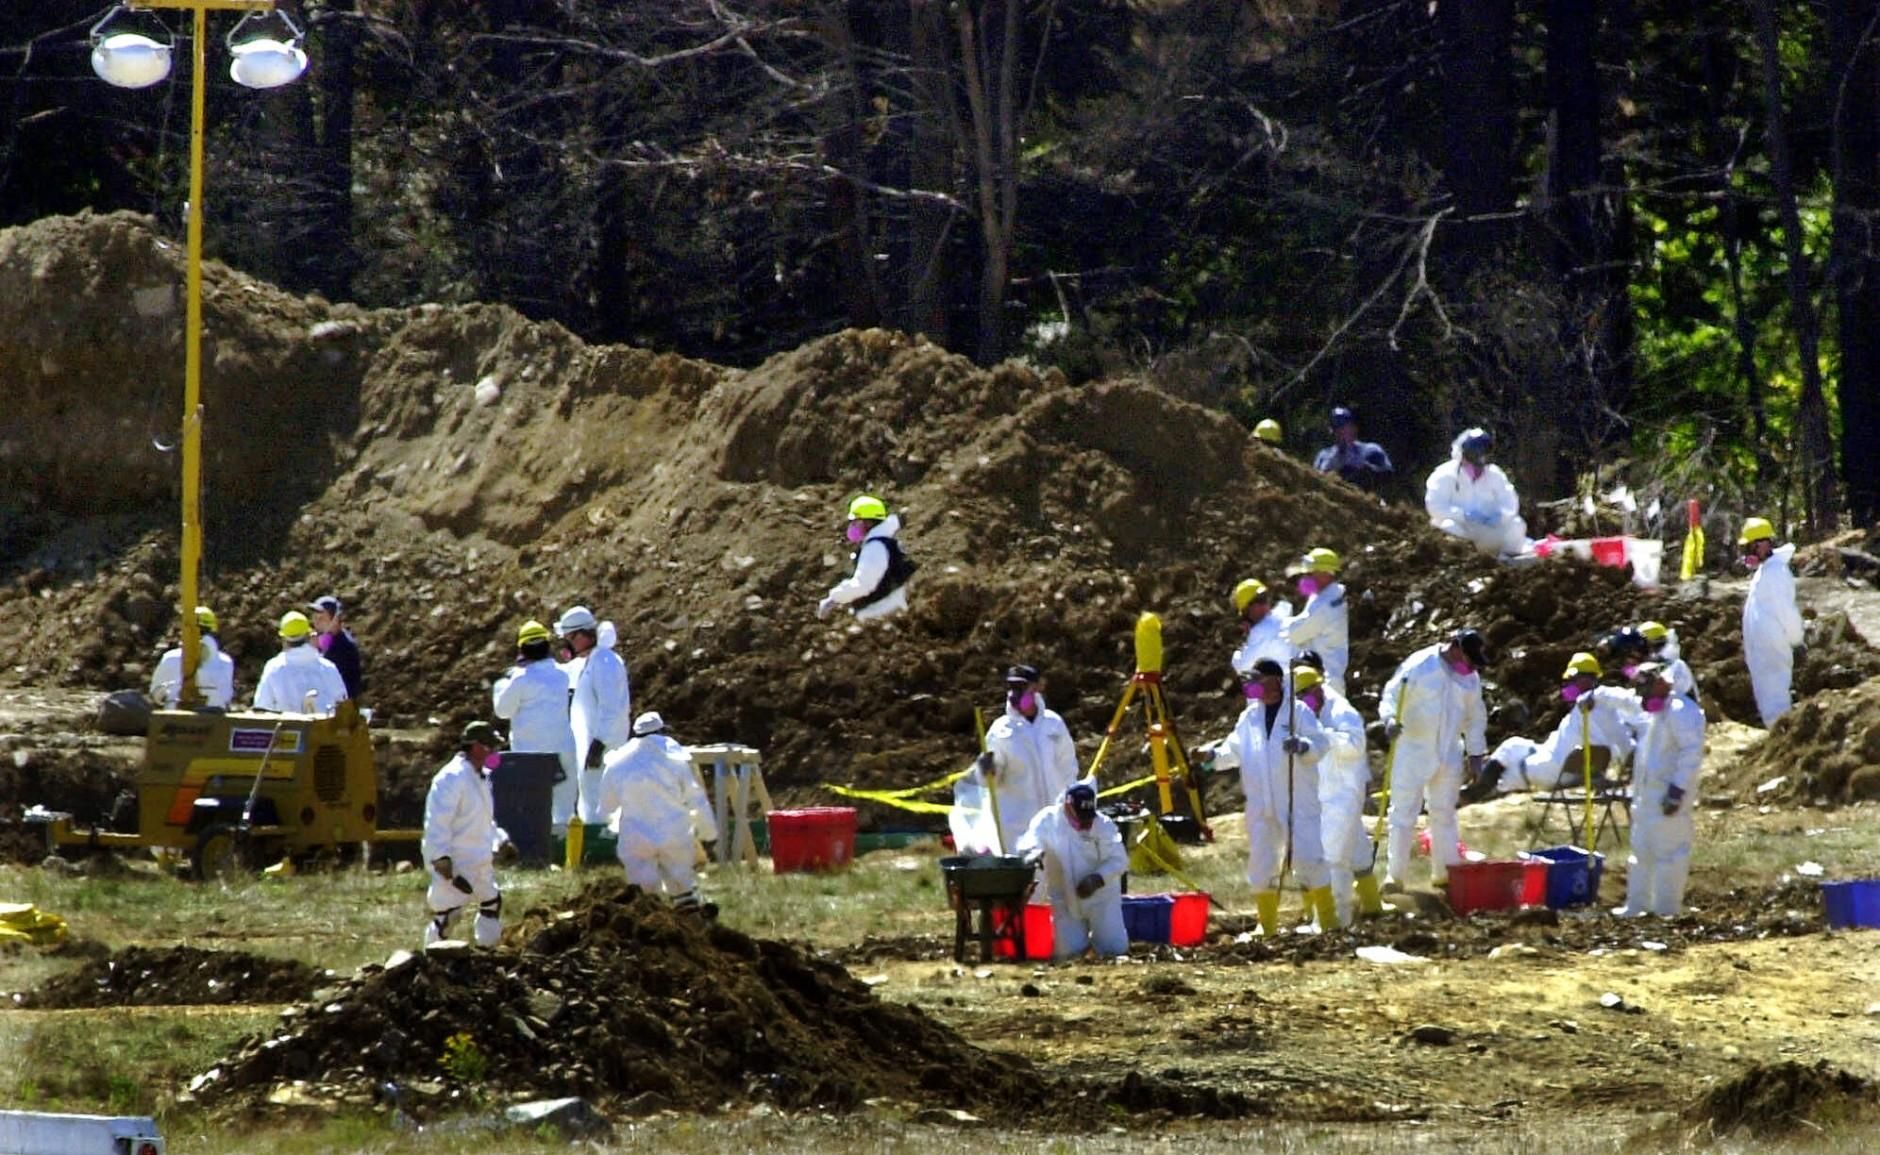 FBI investigators continue their excavation at the Shanksville, Pa., crash site of United Flight 93 on Sunday, Sept. 16, 2001. (AP Photo/Gene J. Puskar)